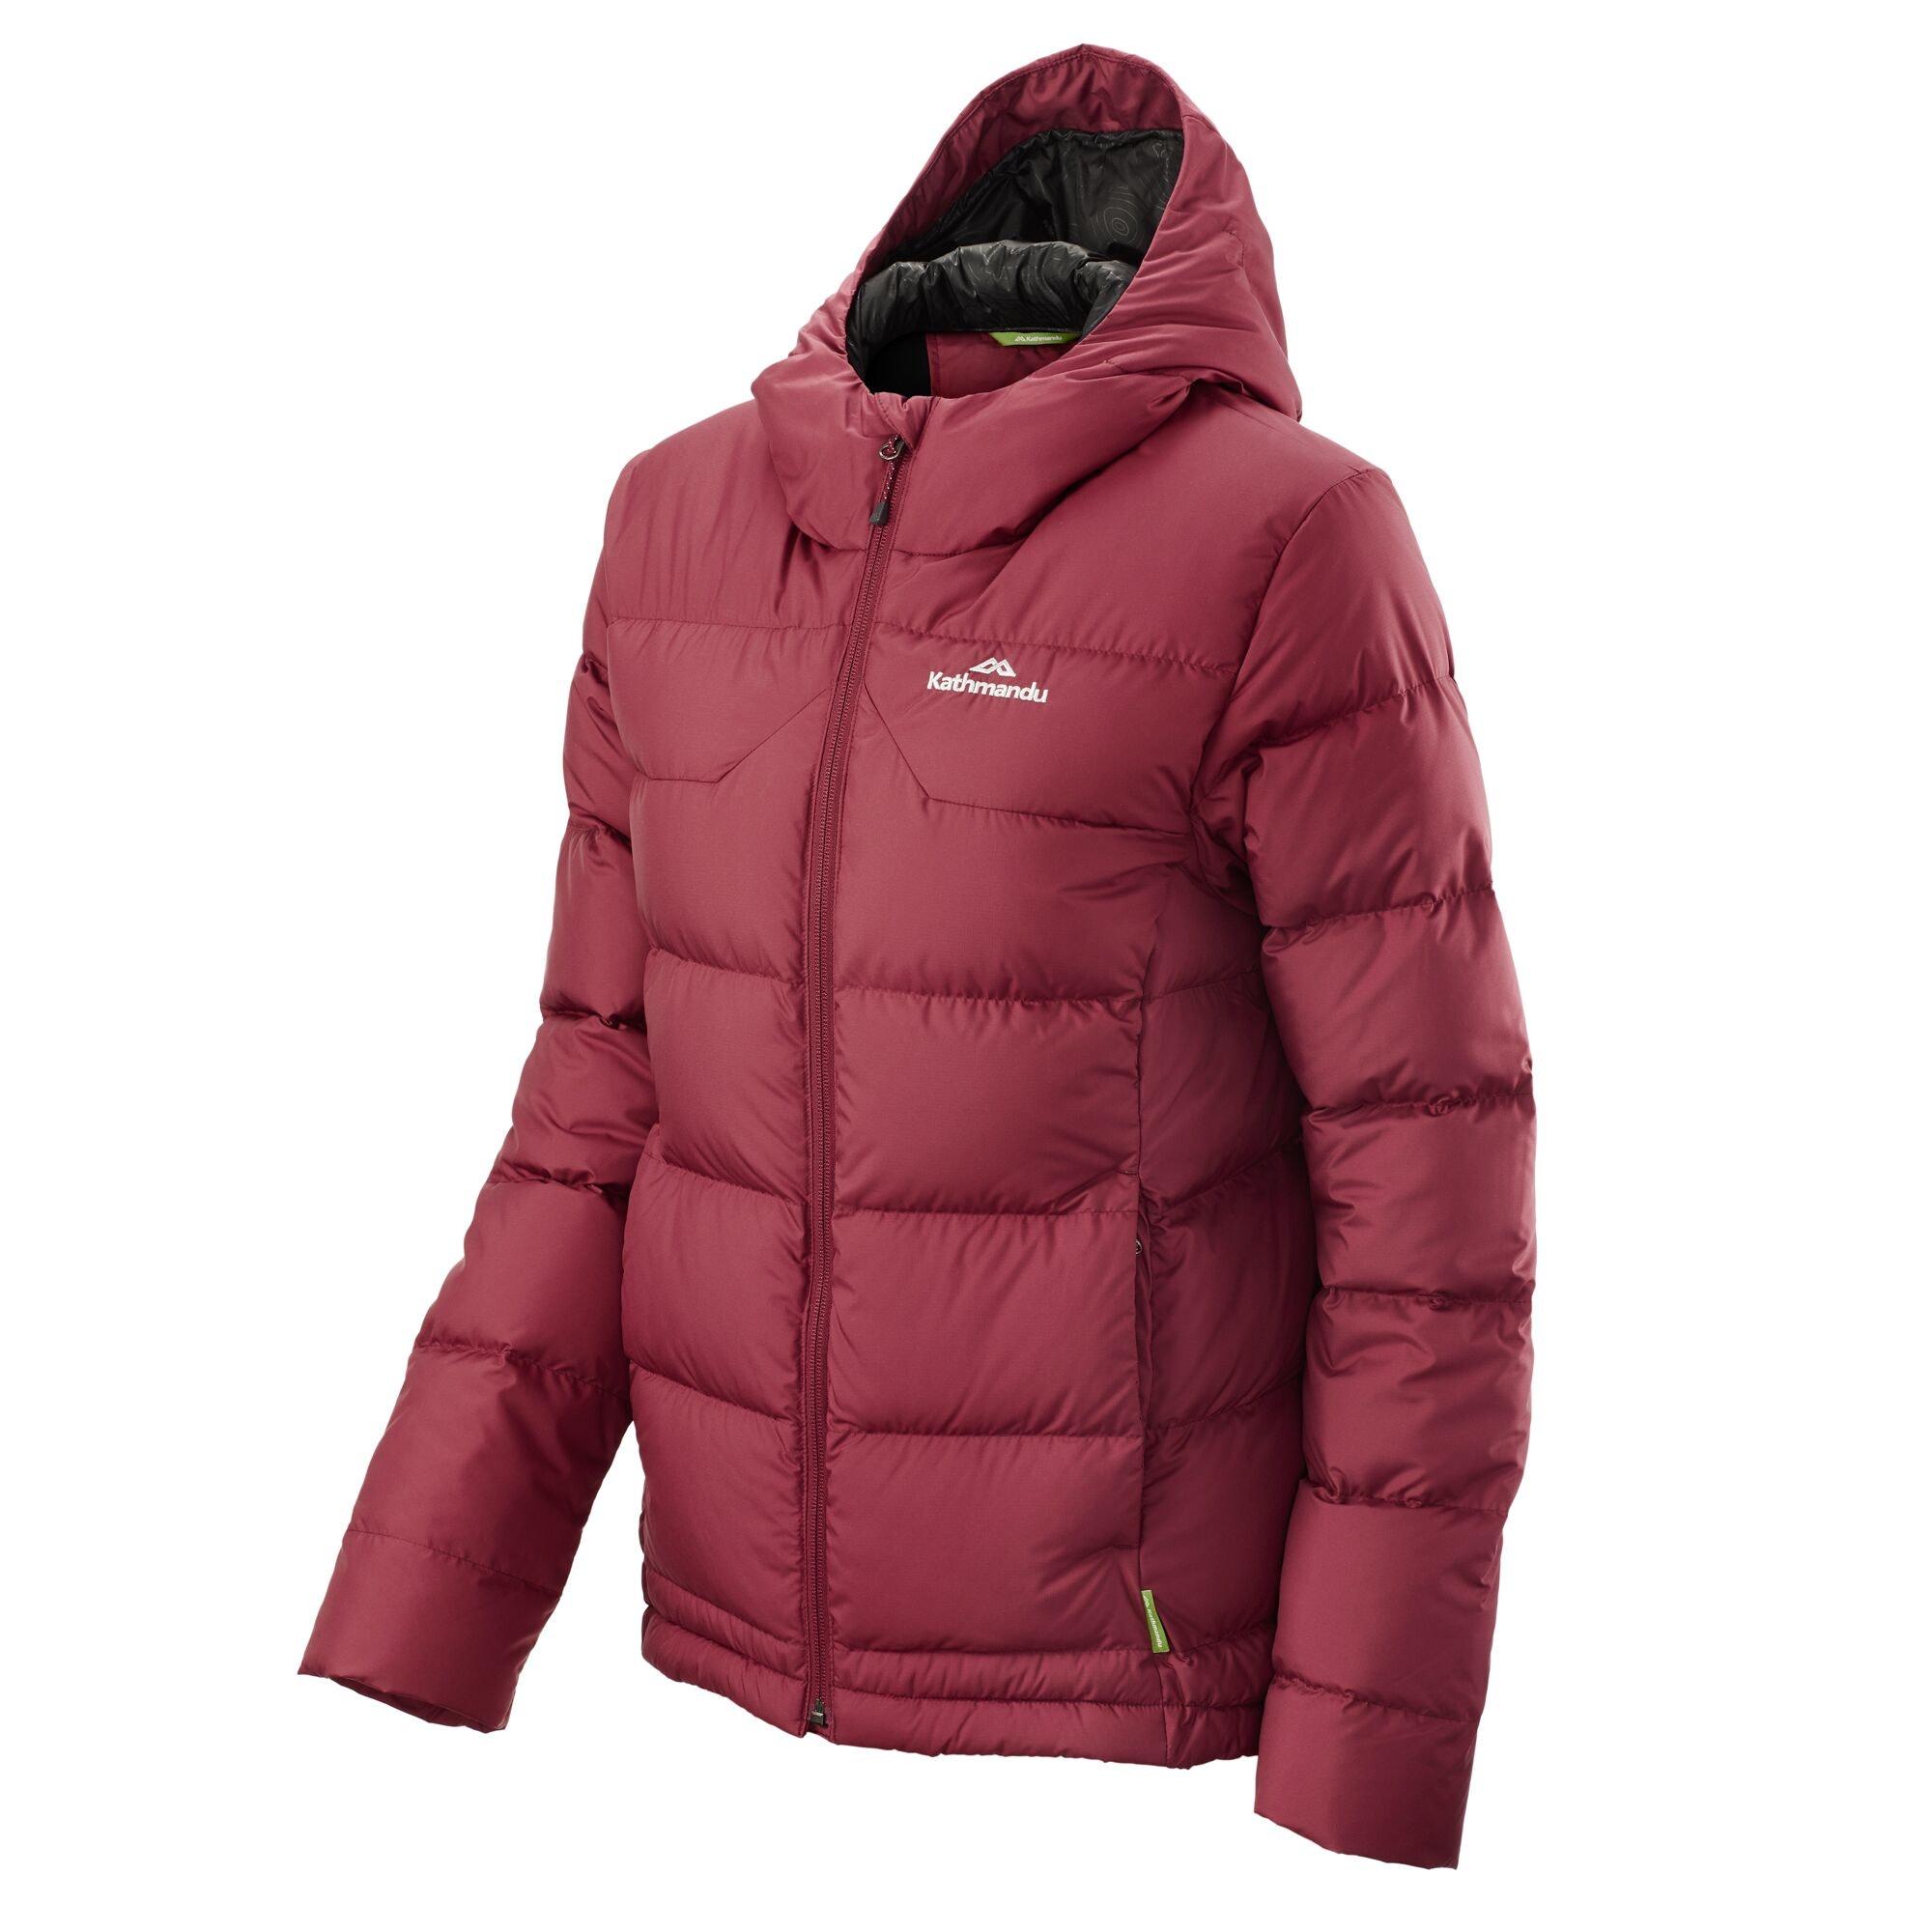 thumbnail 34 - NEW Kathmandu Epiq Womens Hooded Down Puffer 600 Fill Warm Outdoor Winter Jacket